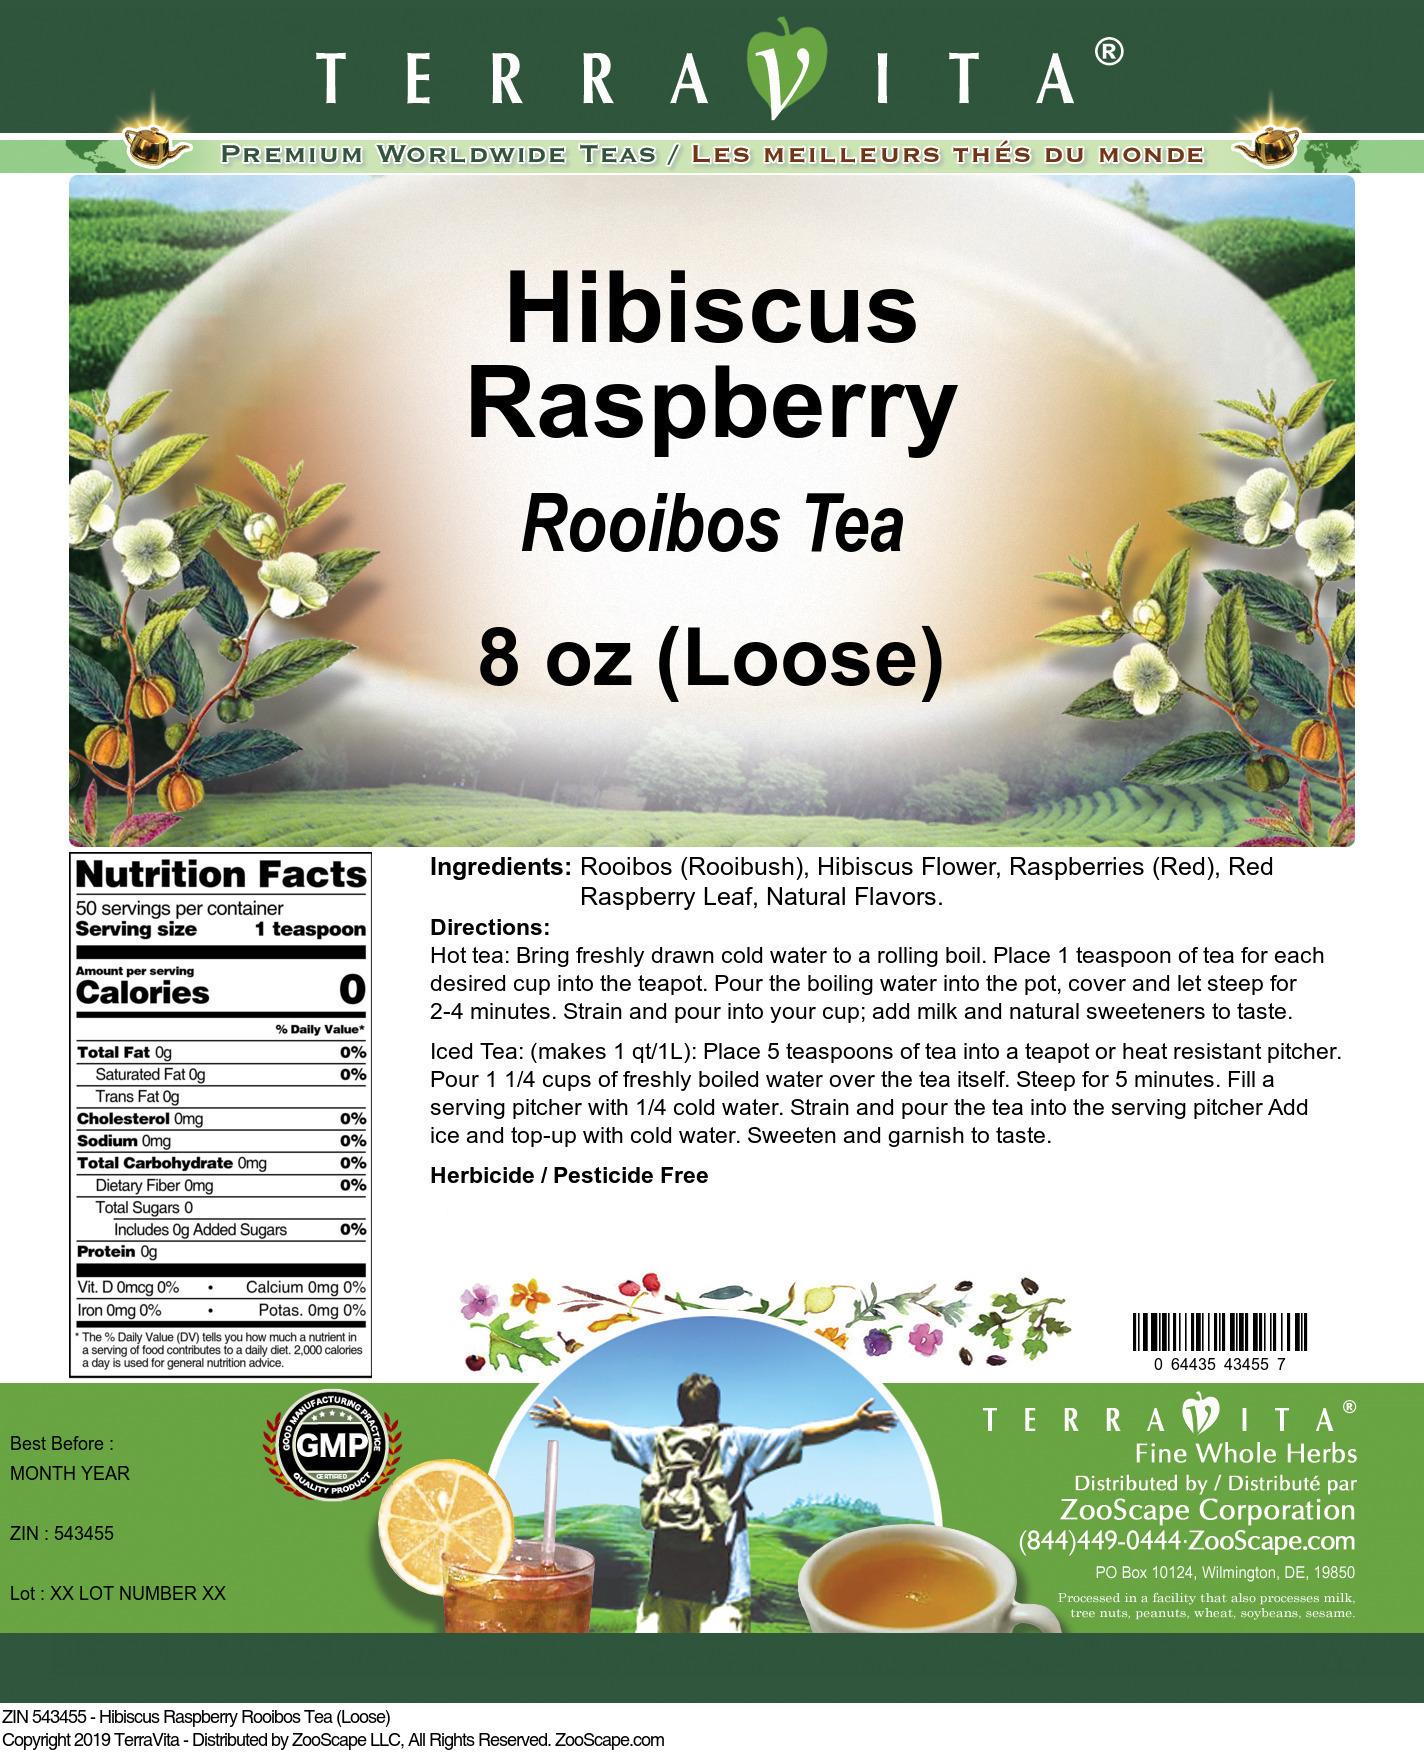 Hibiscus Raspberry Rooibos Tea